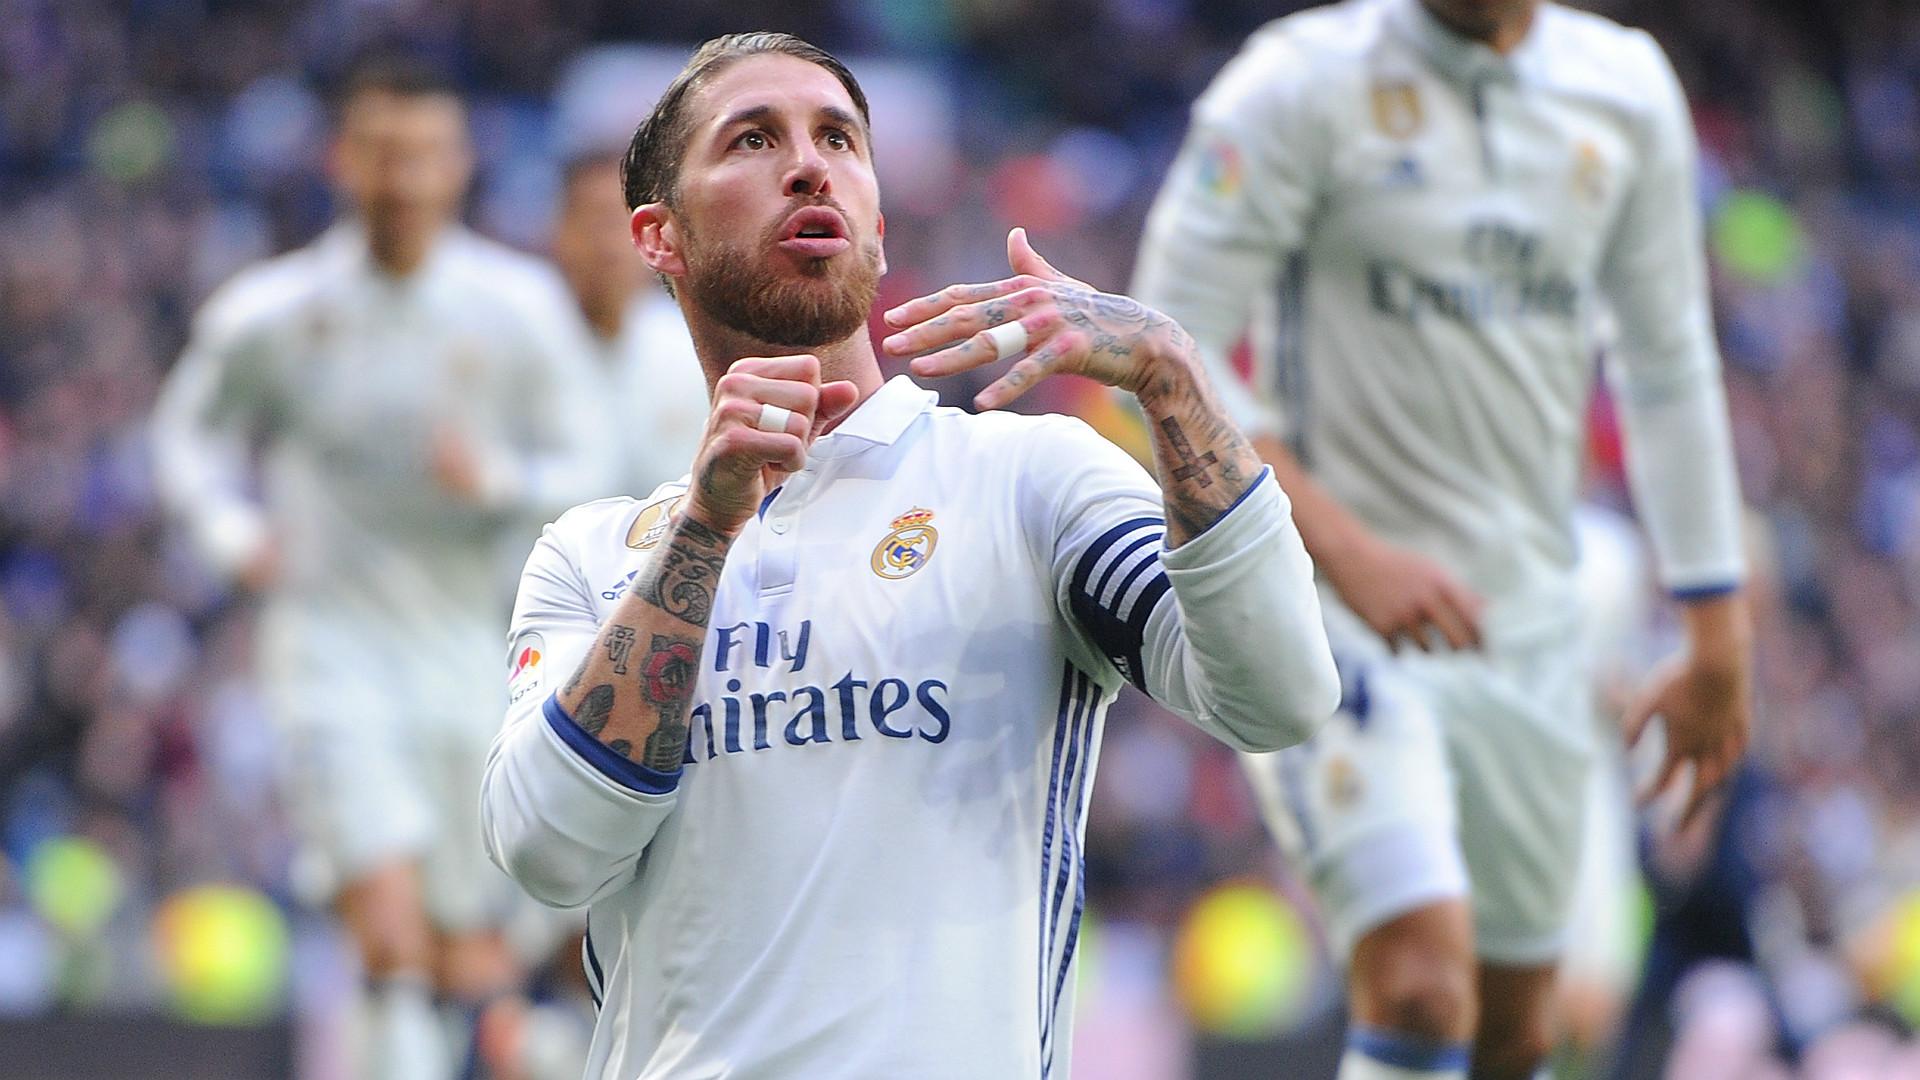 Ramos? Materazzi? Vermaelen? The top goalscoring defenders of the last decade